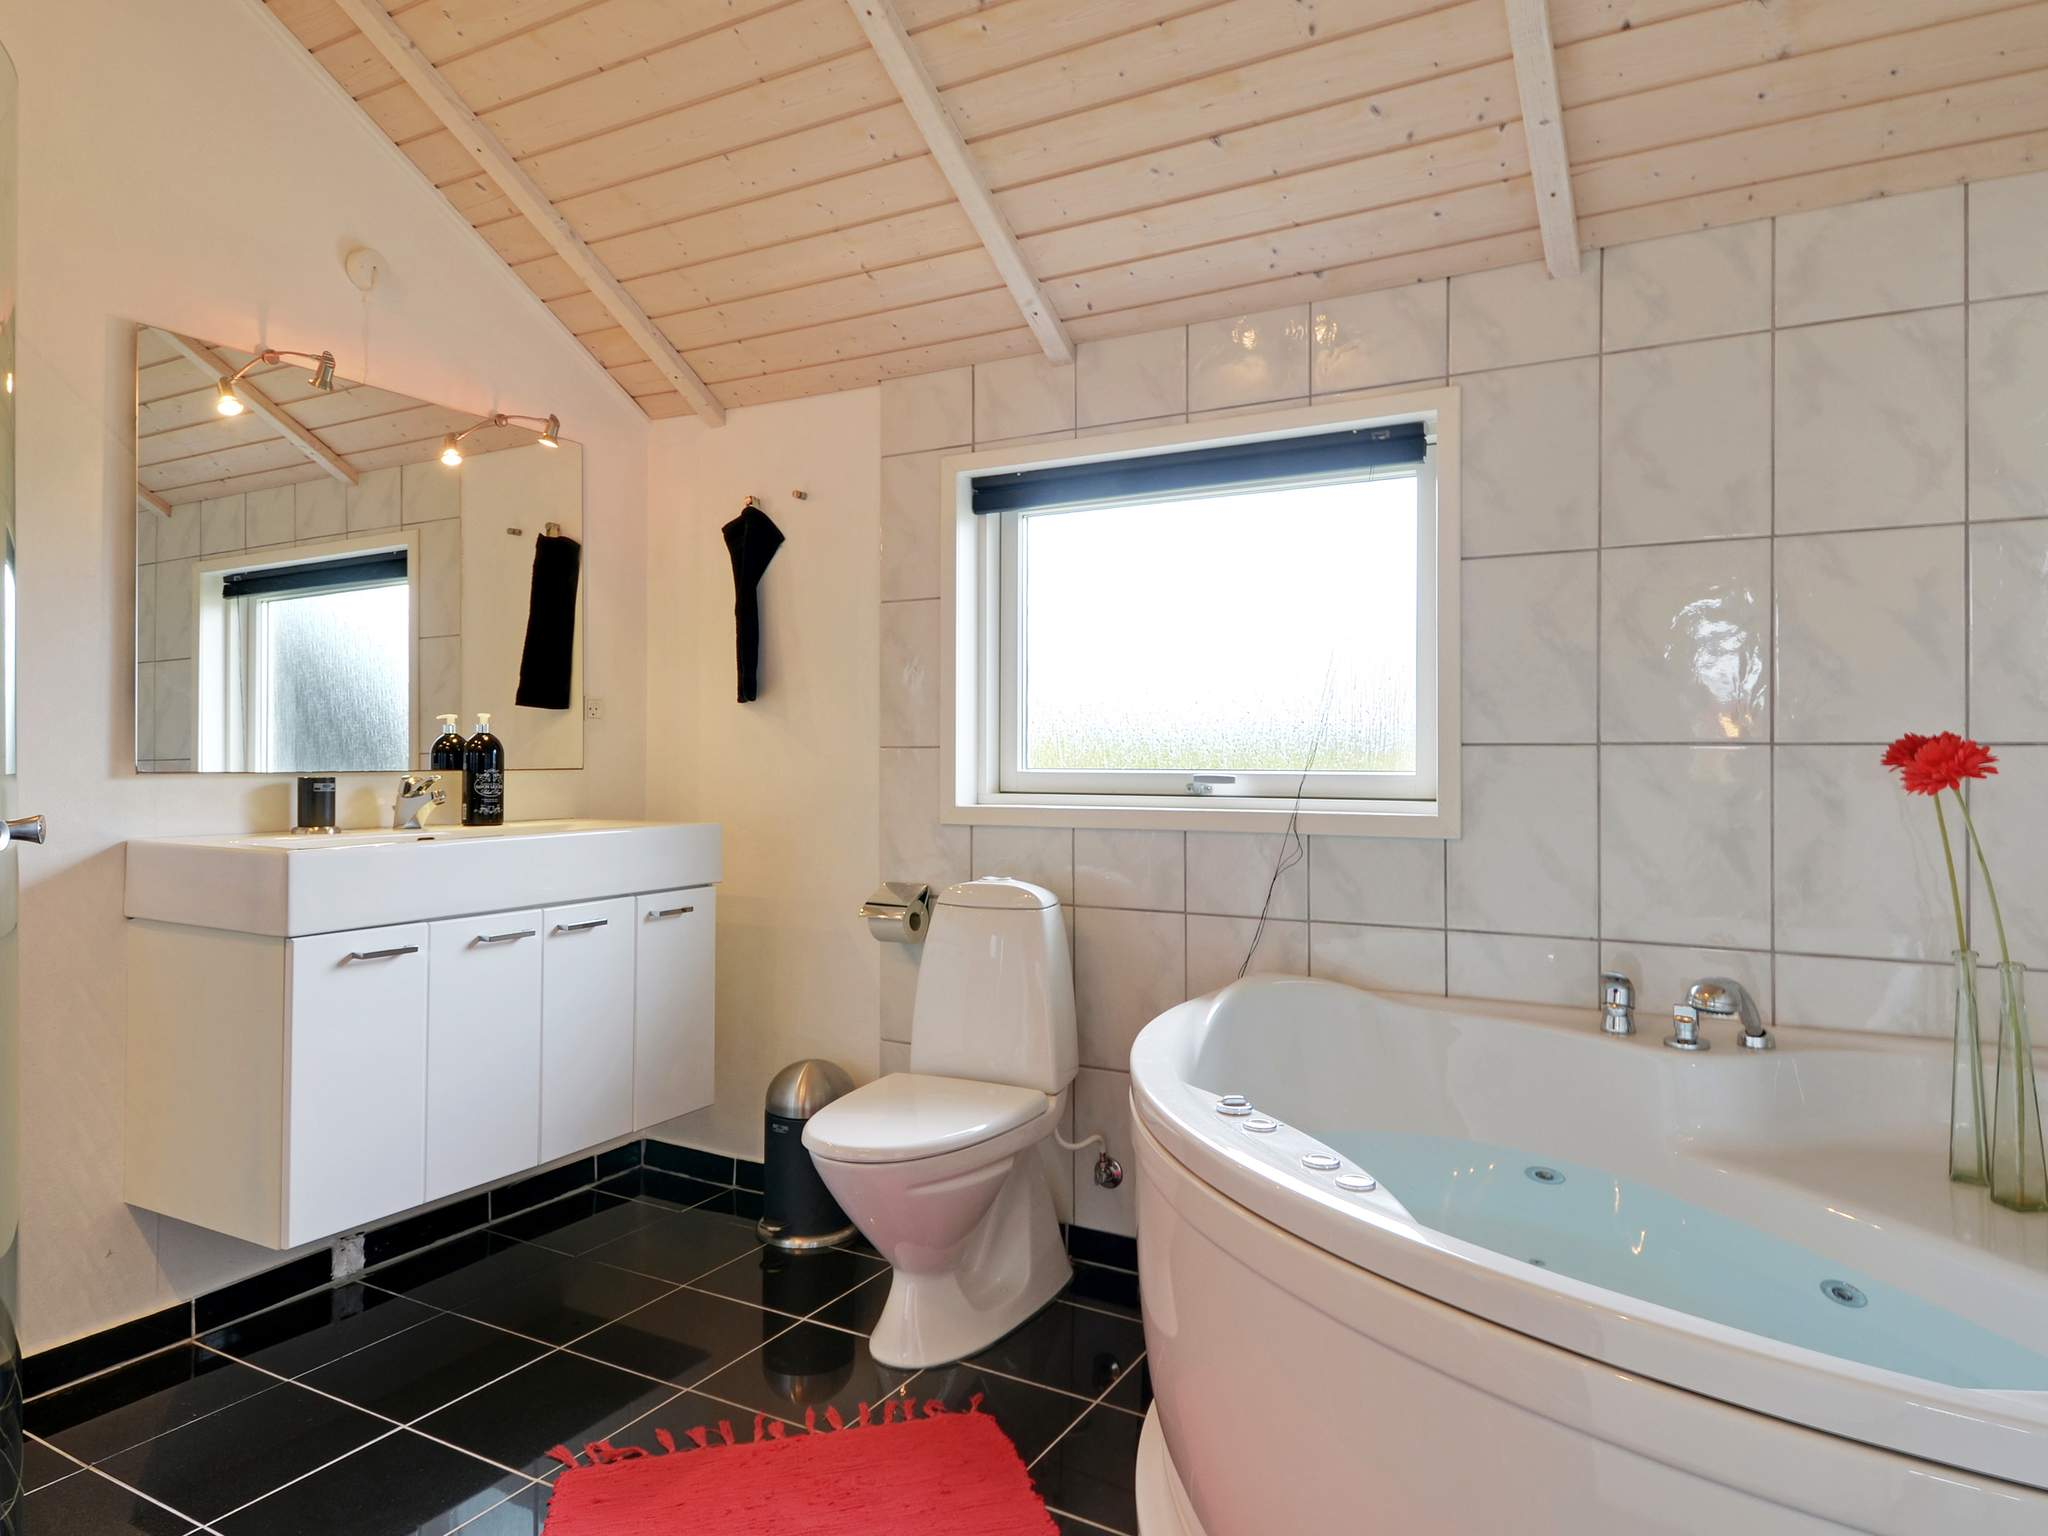 Ferienhaus Skaven Strand (160058), Tarm, , Westjütland, Dänemark, Bild 8